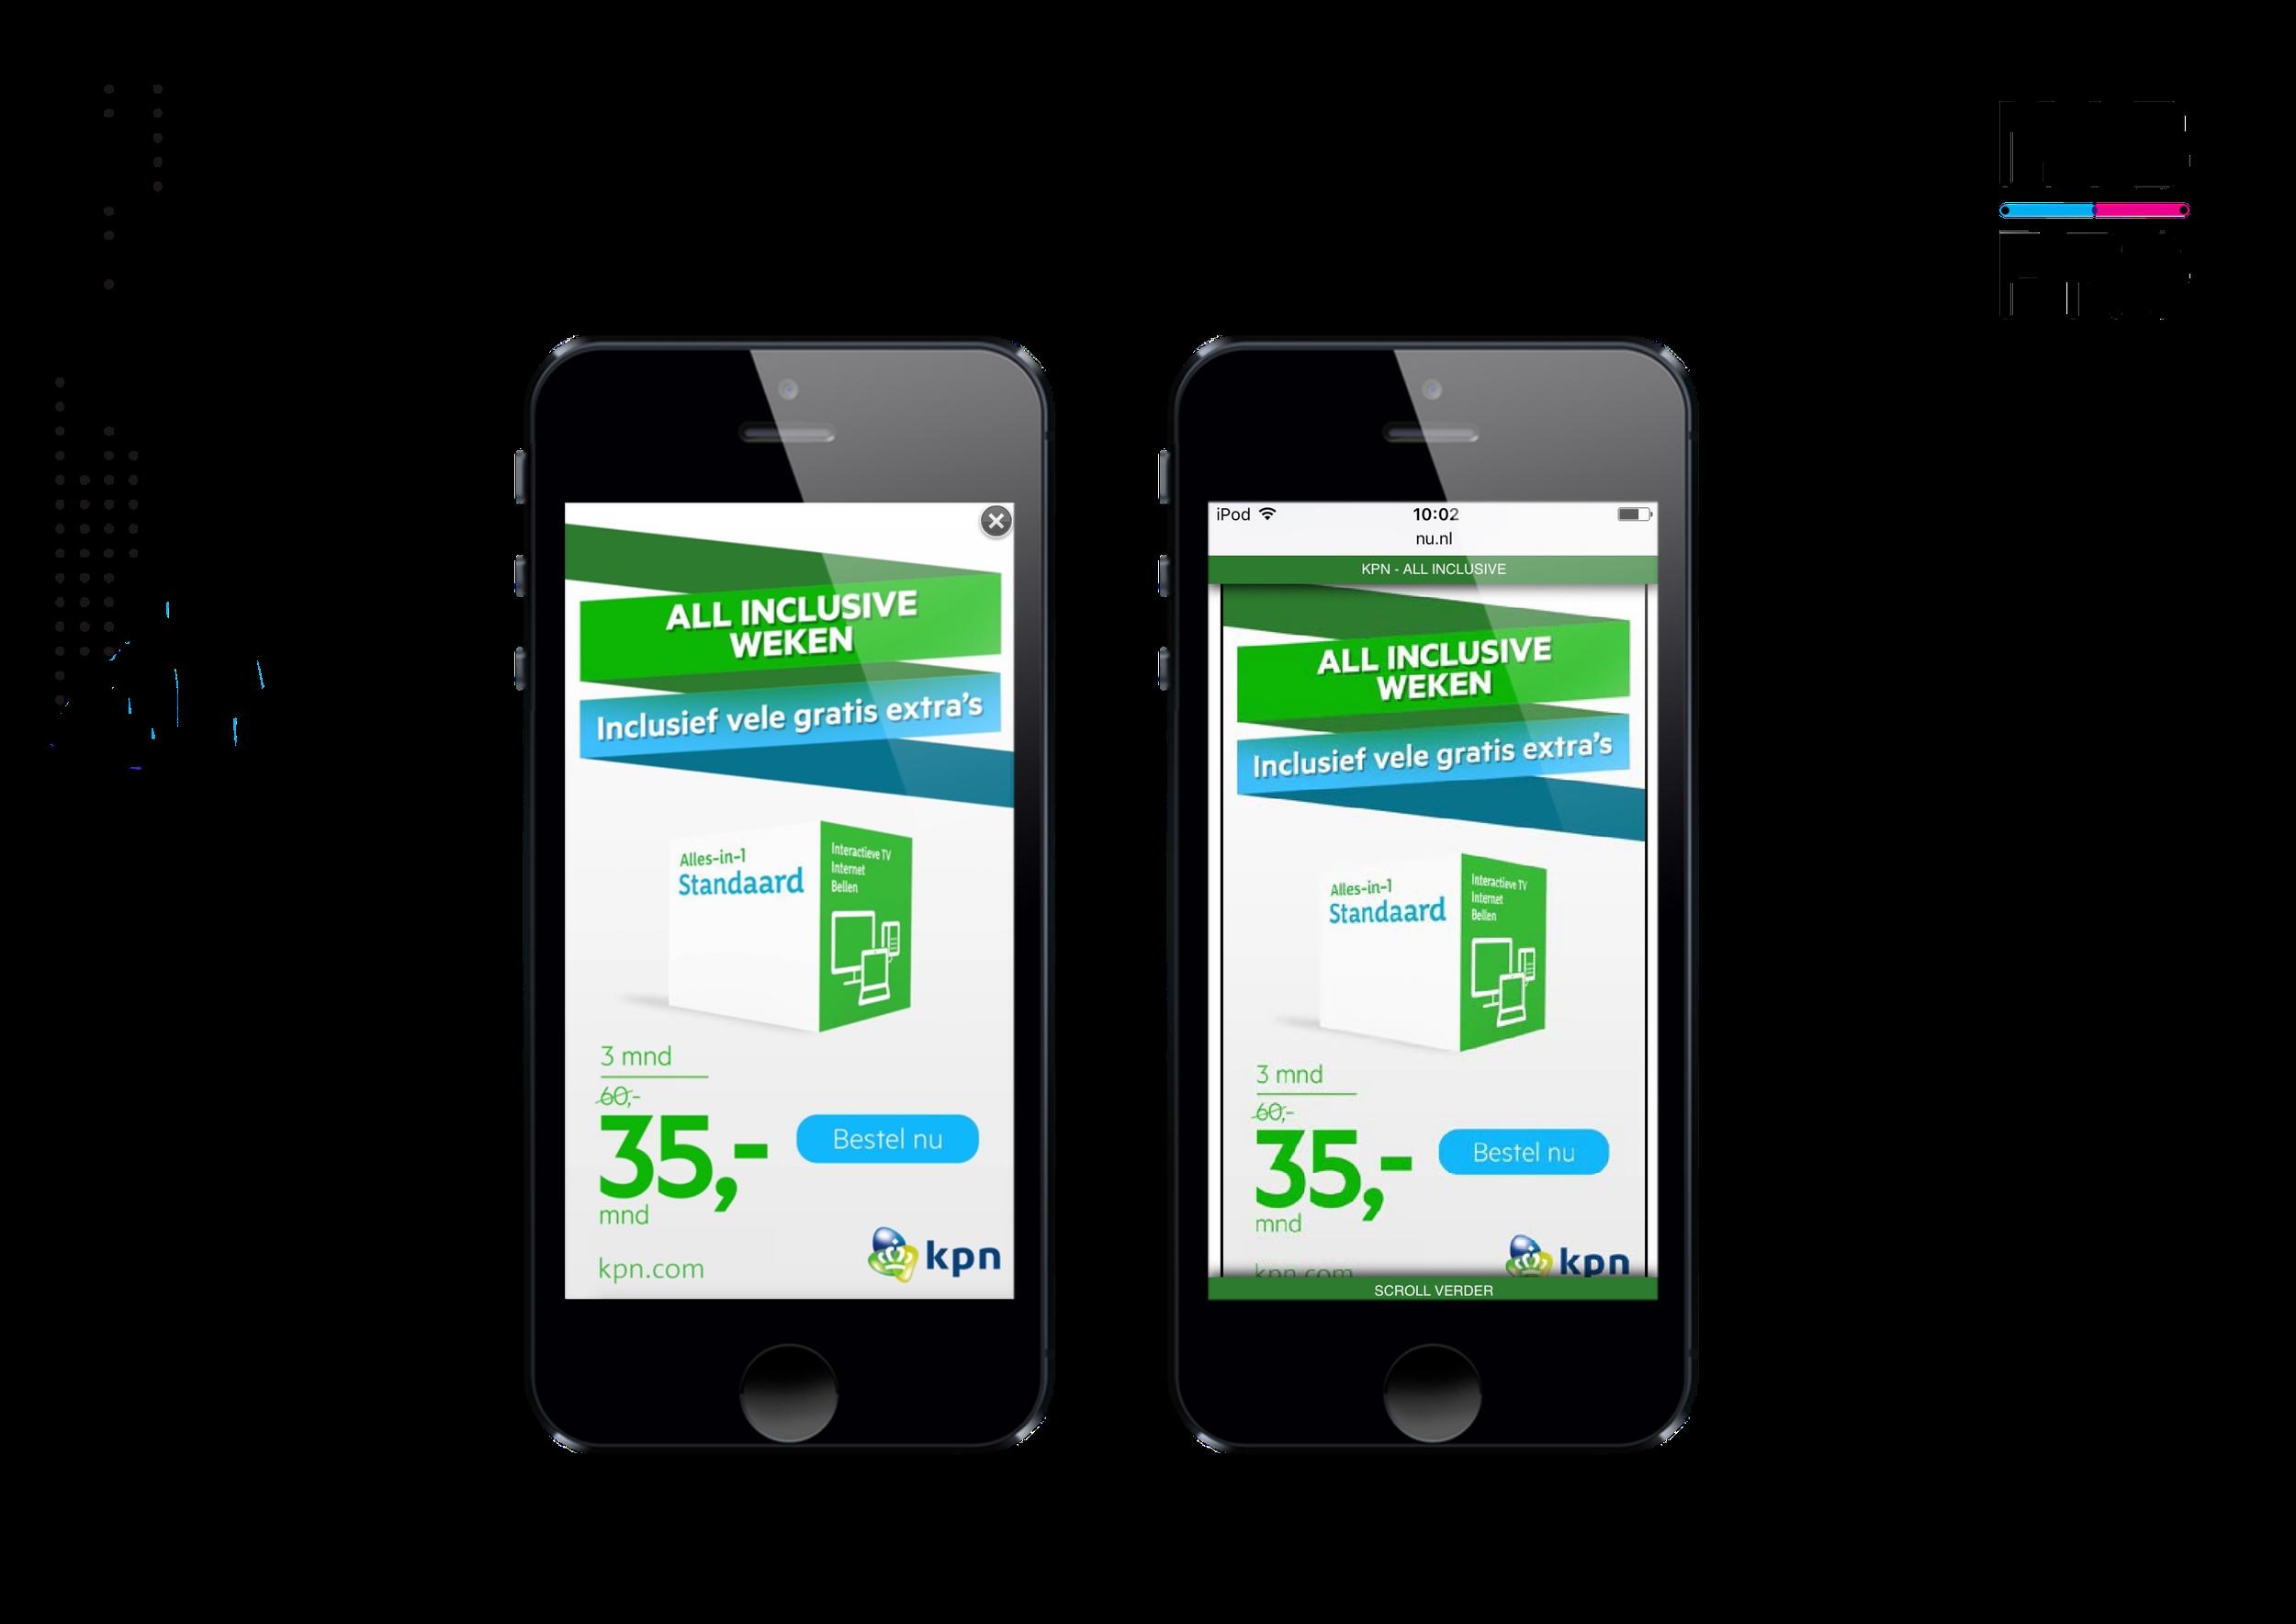 KPN All Inclusive_Full size_Screenshots_MobPro